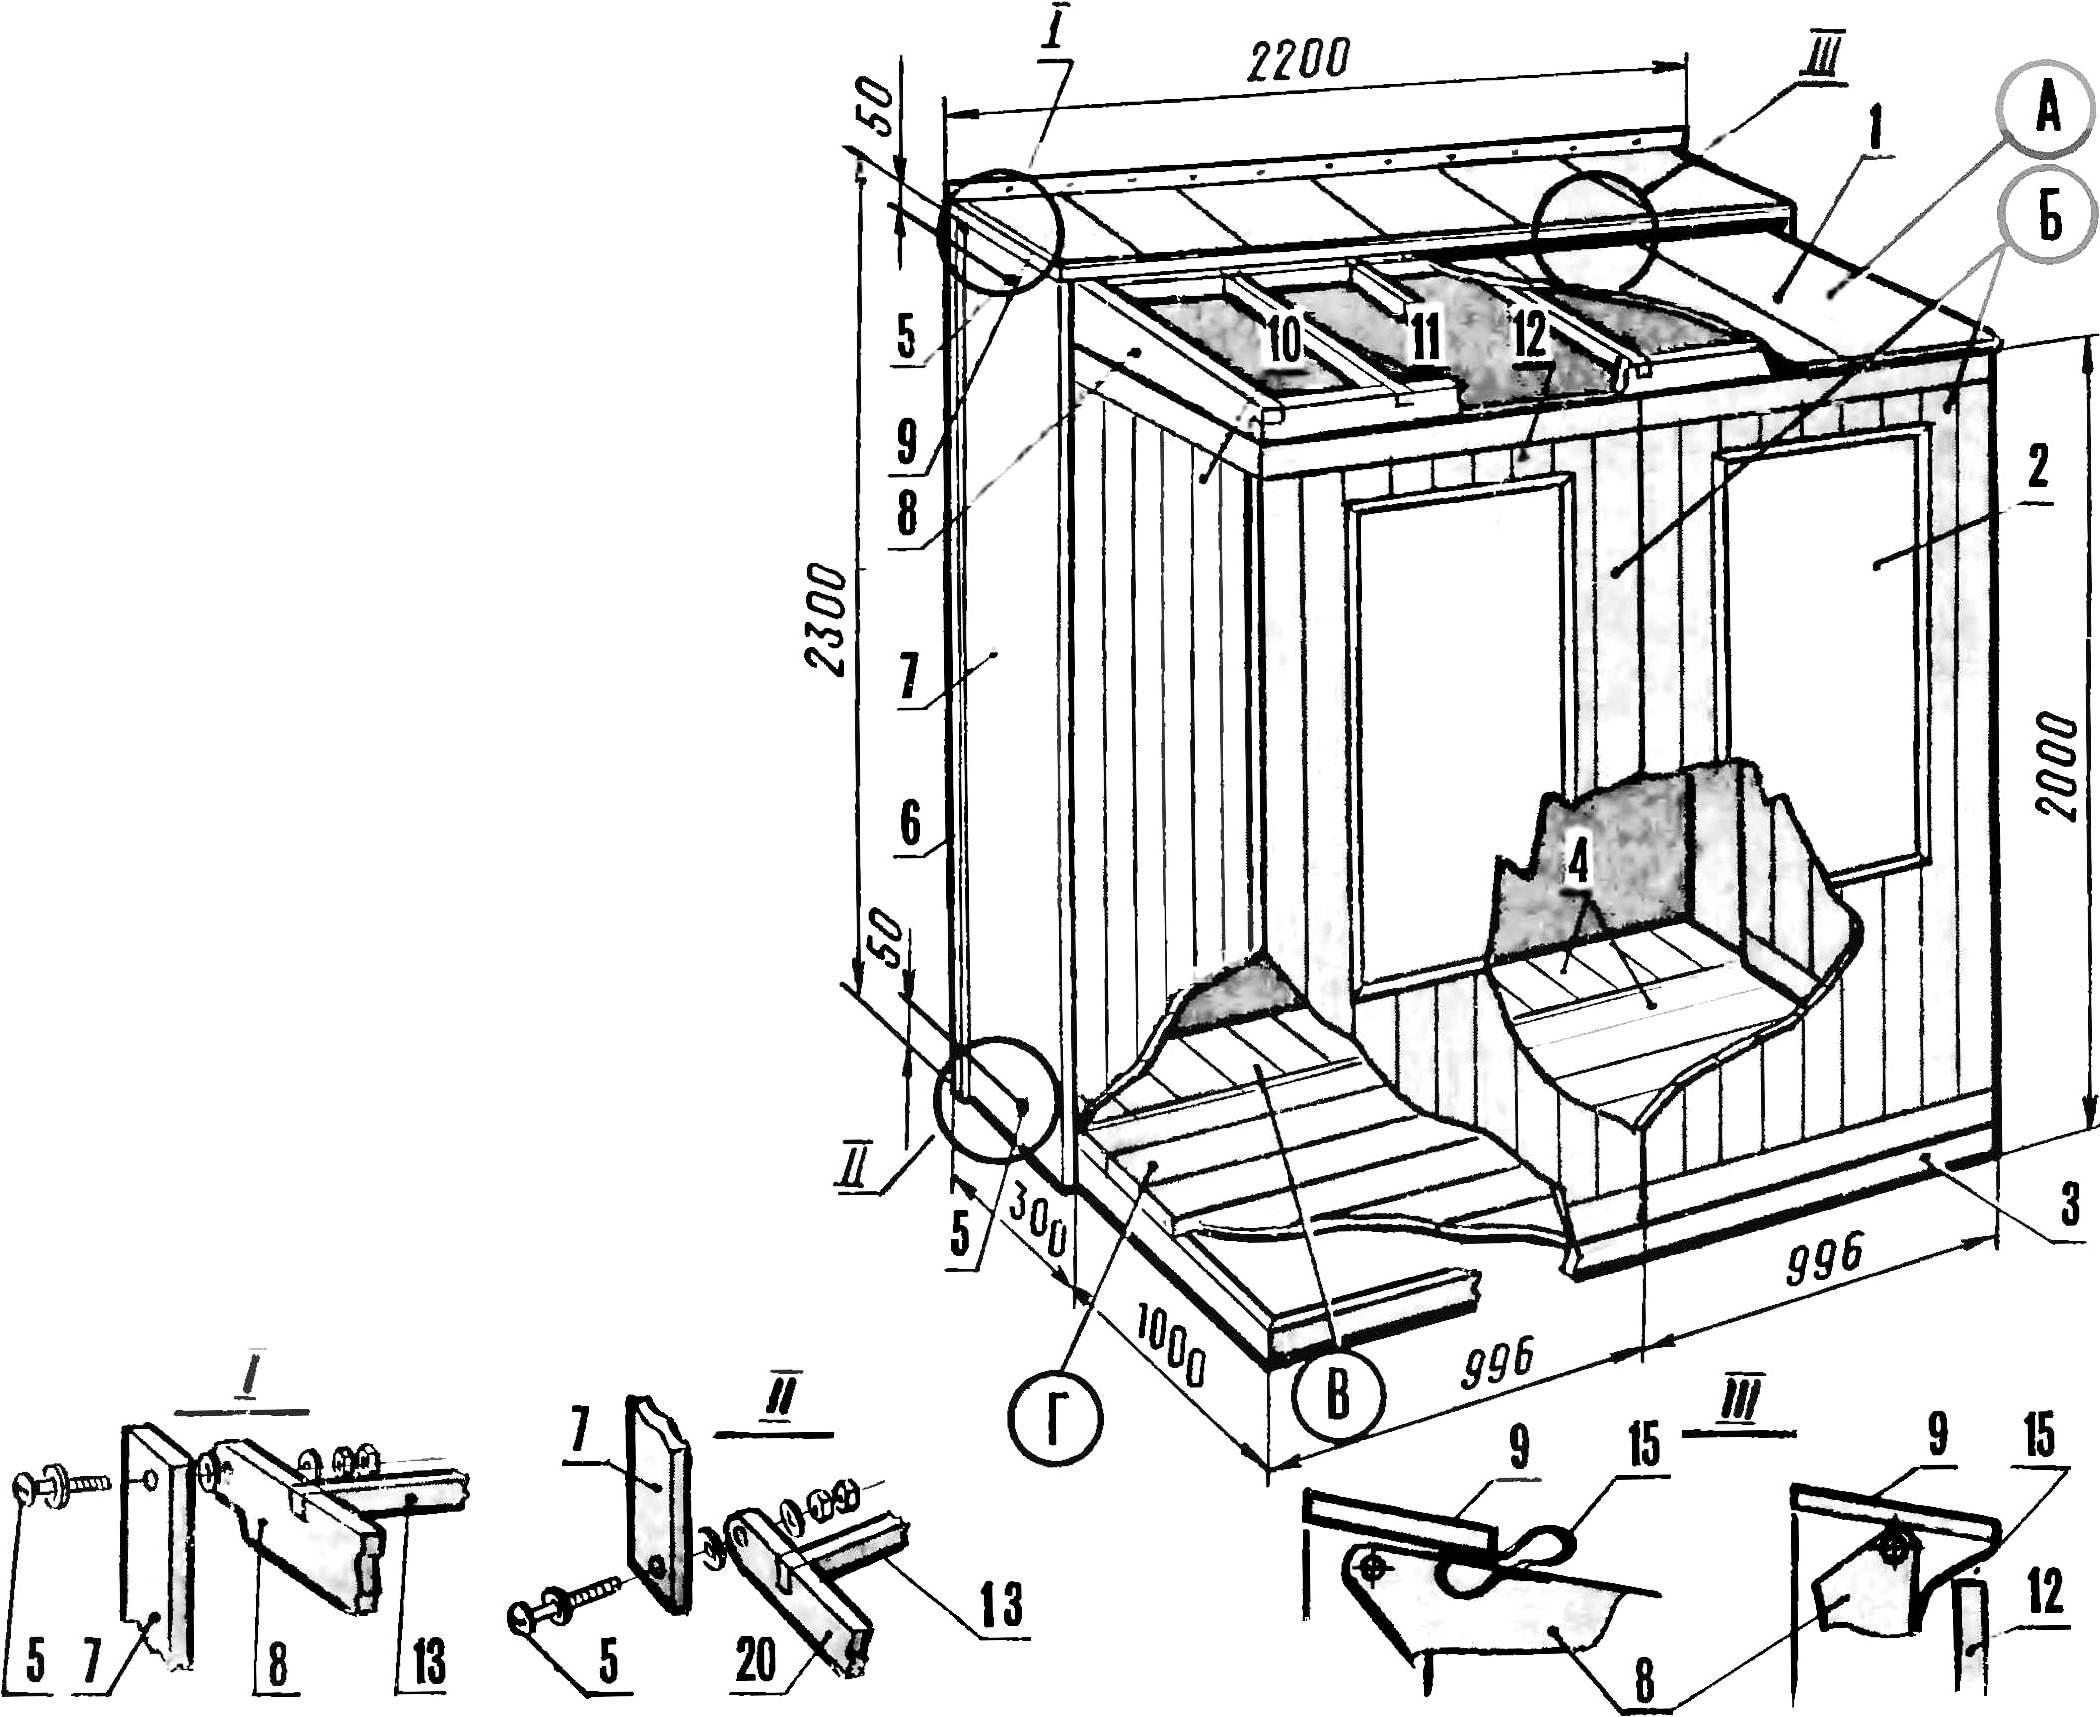 Foldable amenities building-Annex